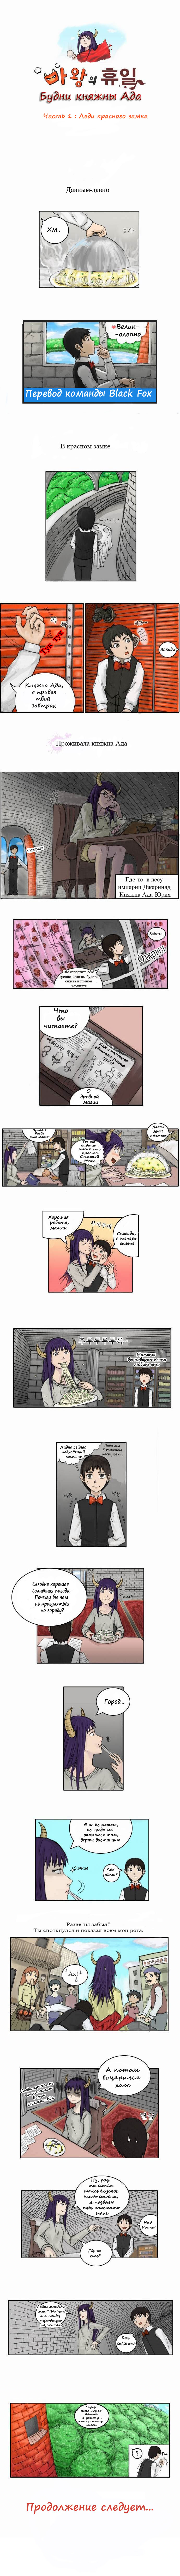 https://r1.ninemanga.com/comics/pic2/23/27095/273842/1442048705293.jpg Page 1